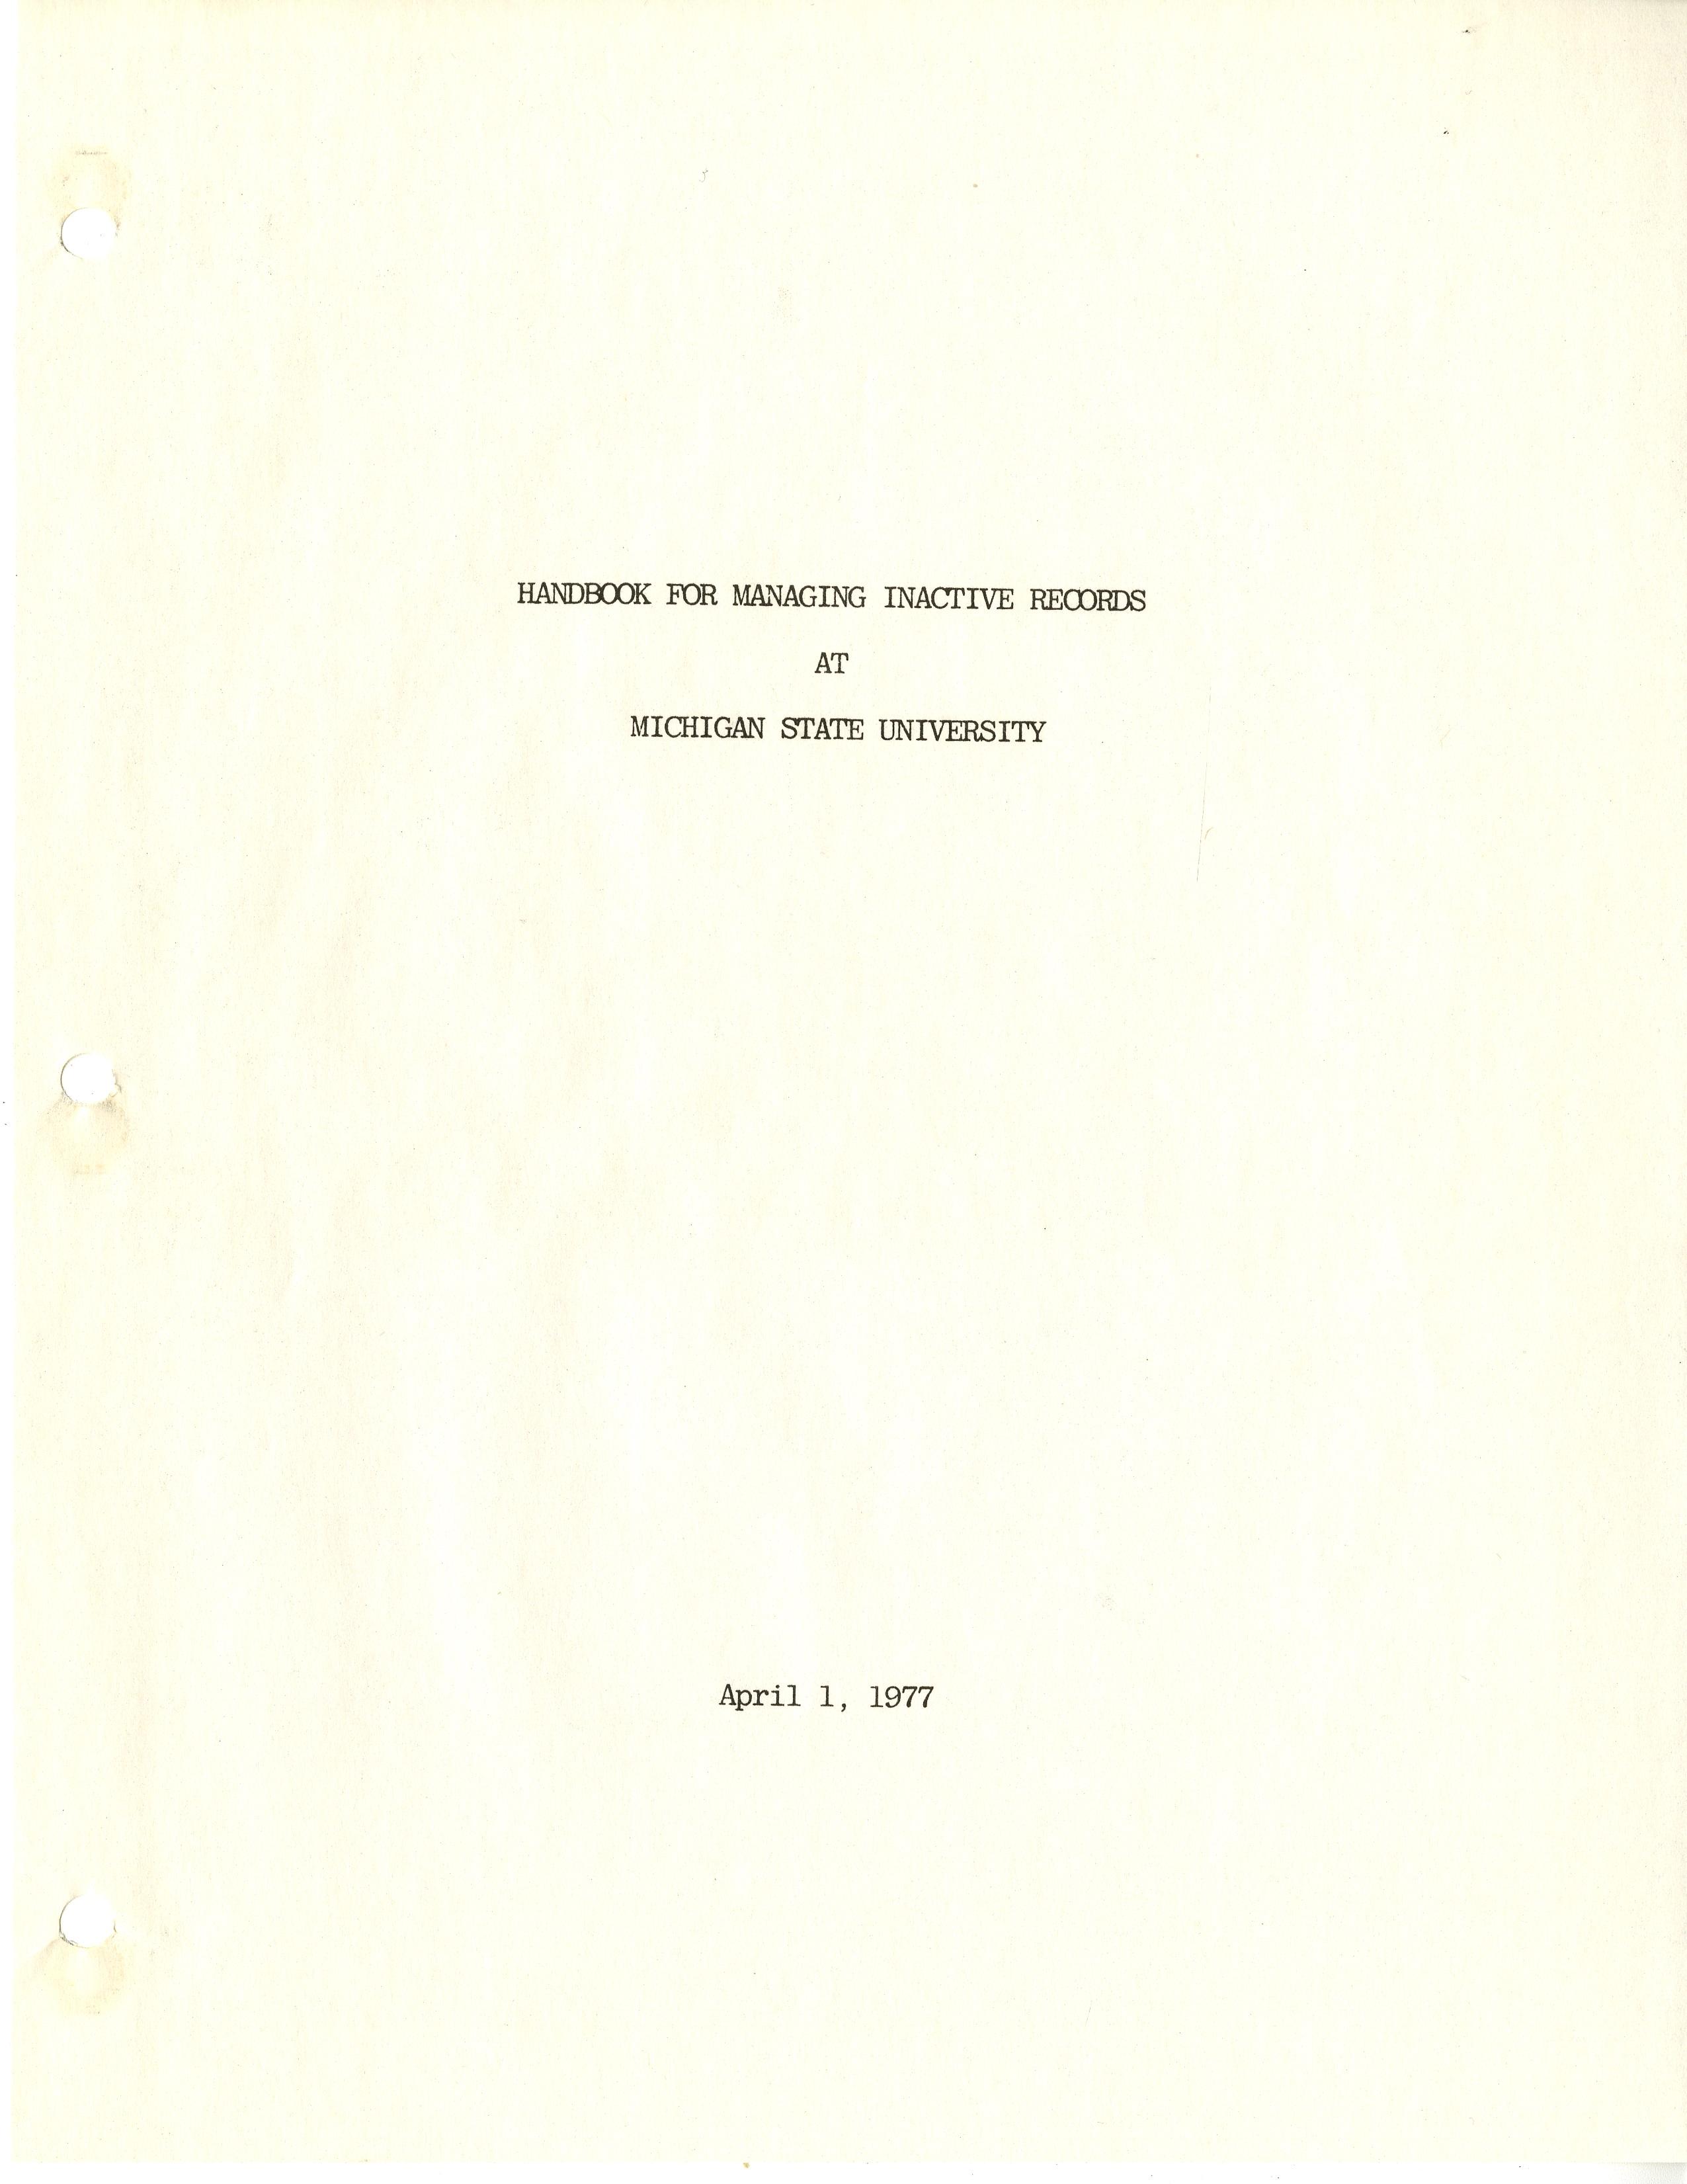 (Retired) Records Management Handbook, 1977